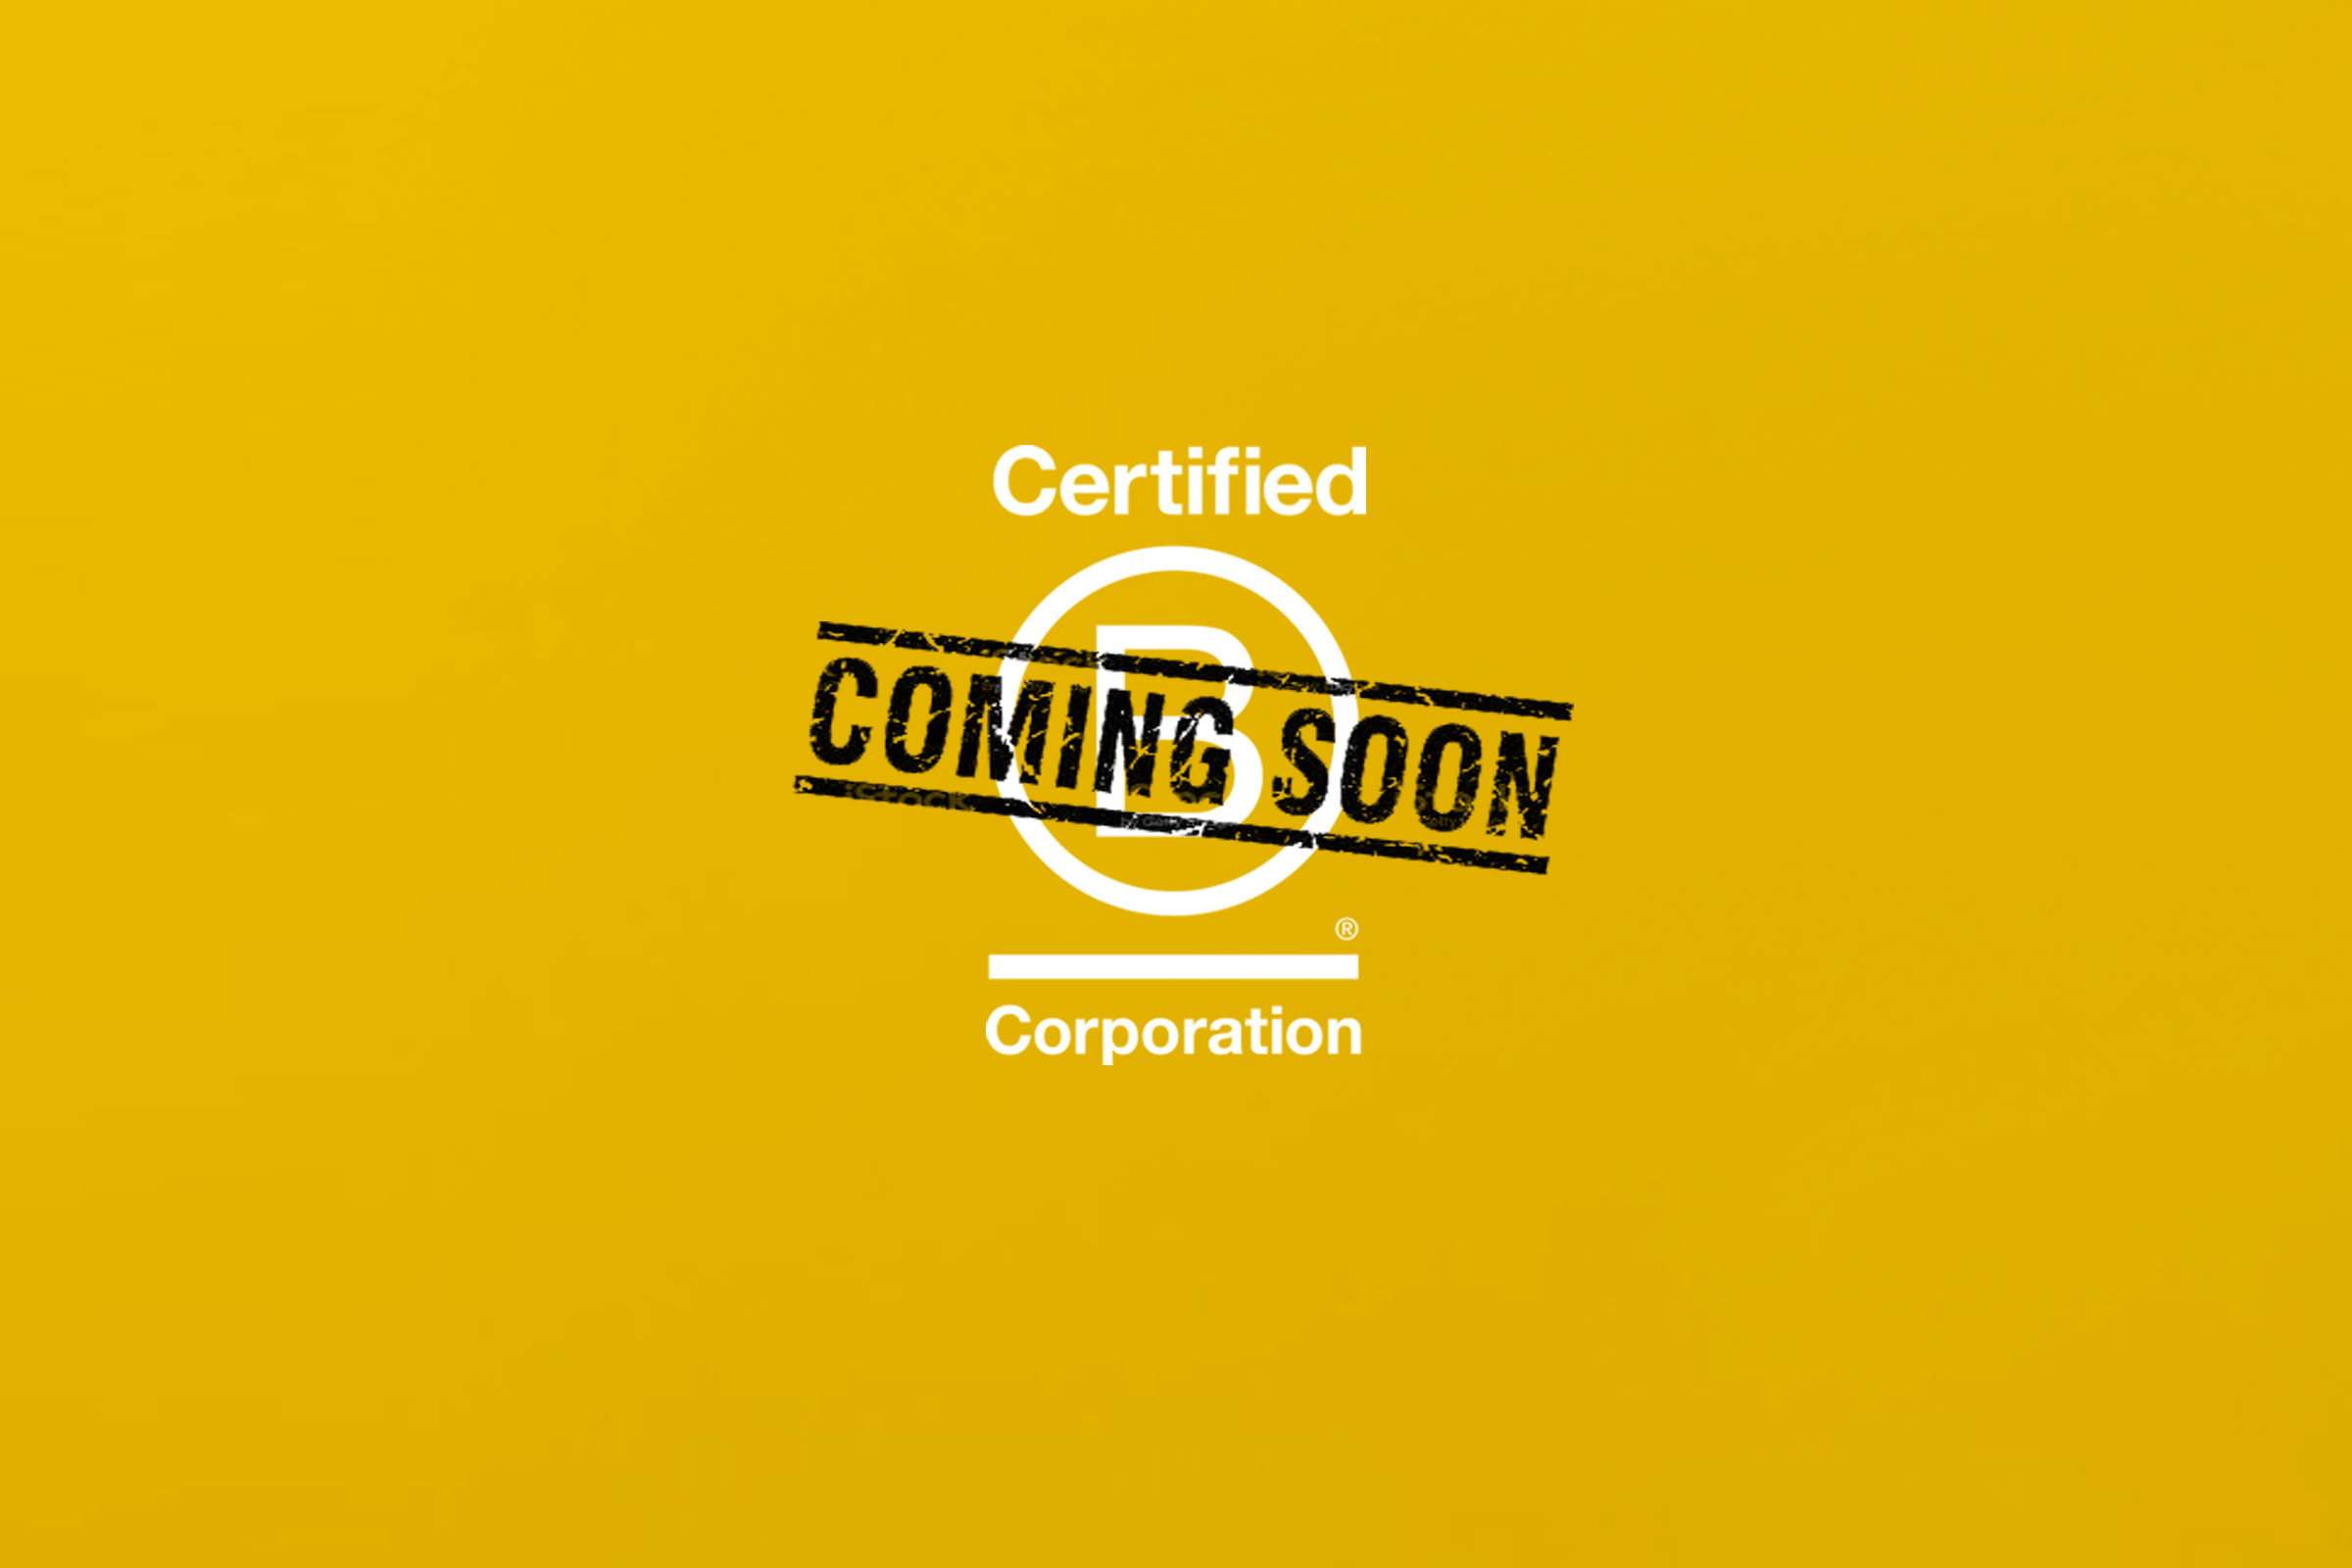 Coming soon - Certified B-Corp